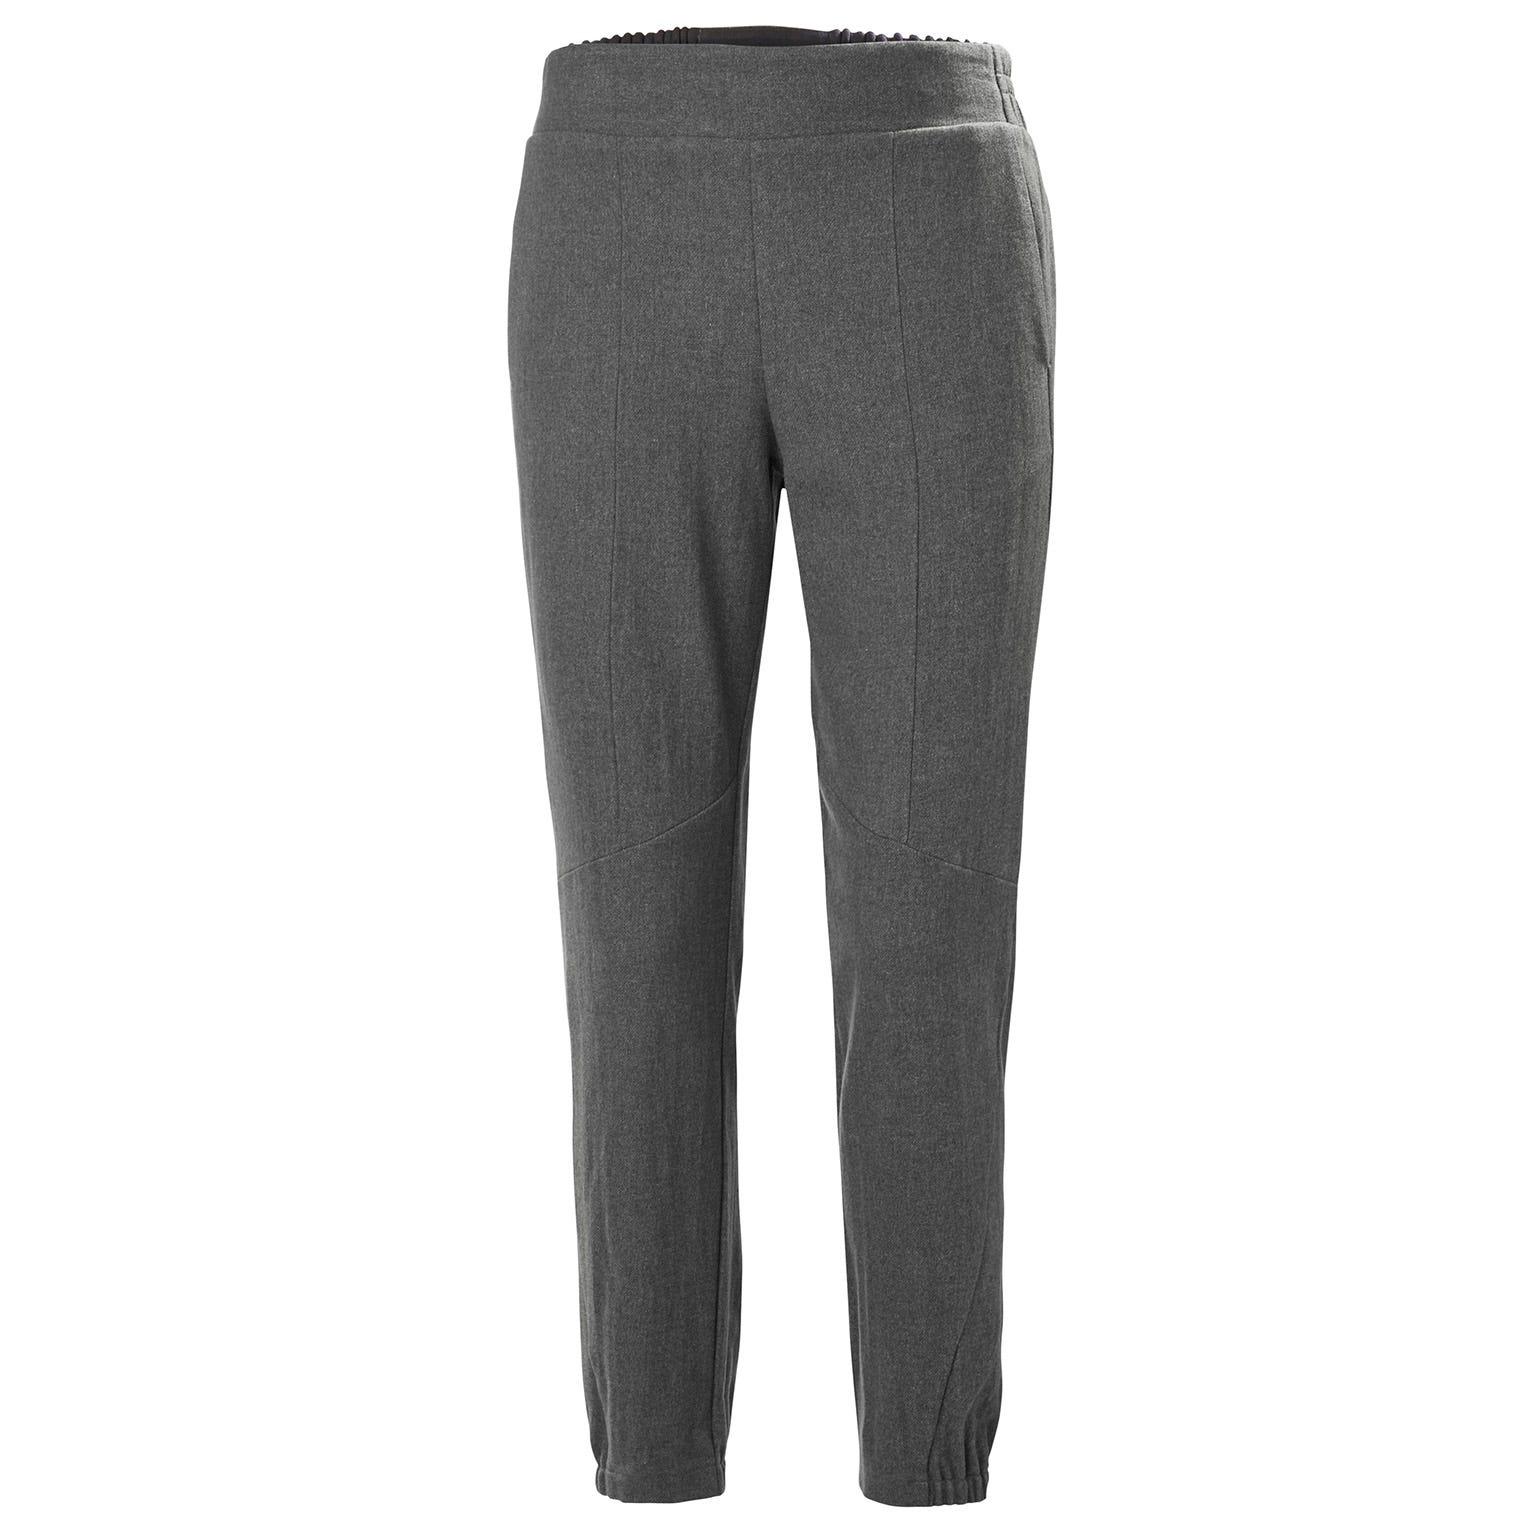 Helly Hansen W Wool Travel Pant Womens Hiking Grey S